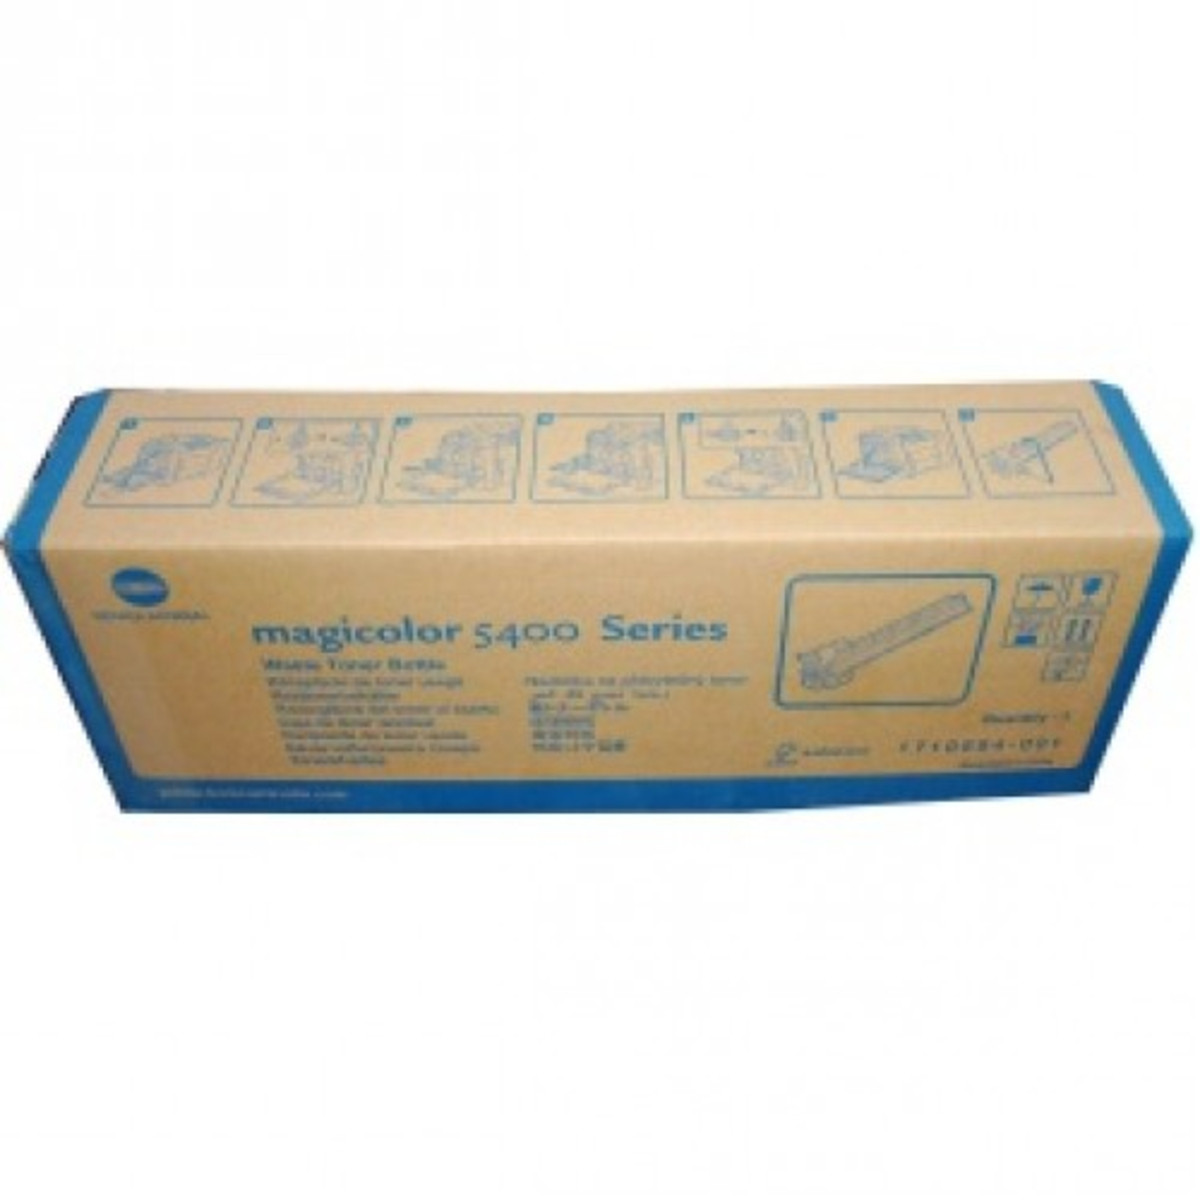 Konica Minolta Magicolor 5430DL Waste Bottle